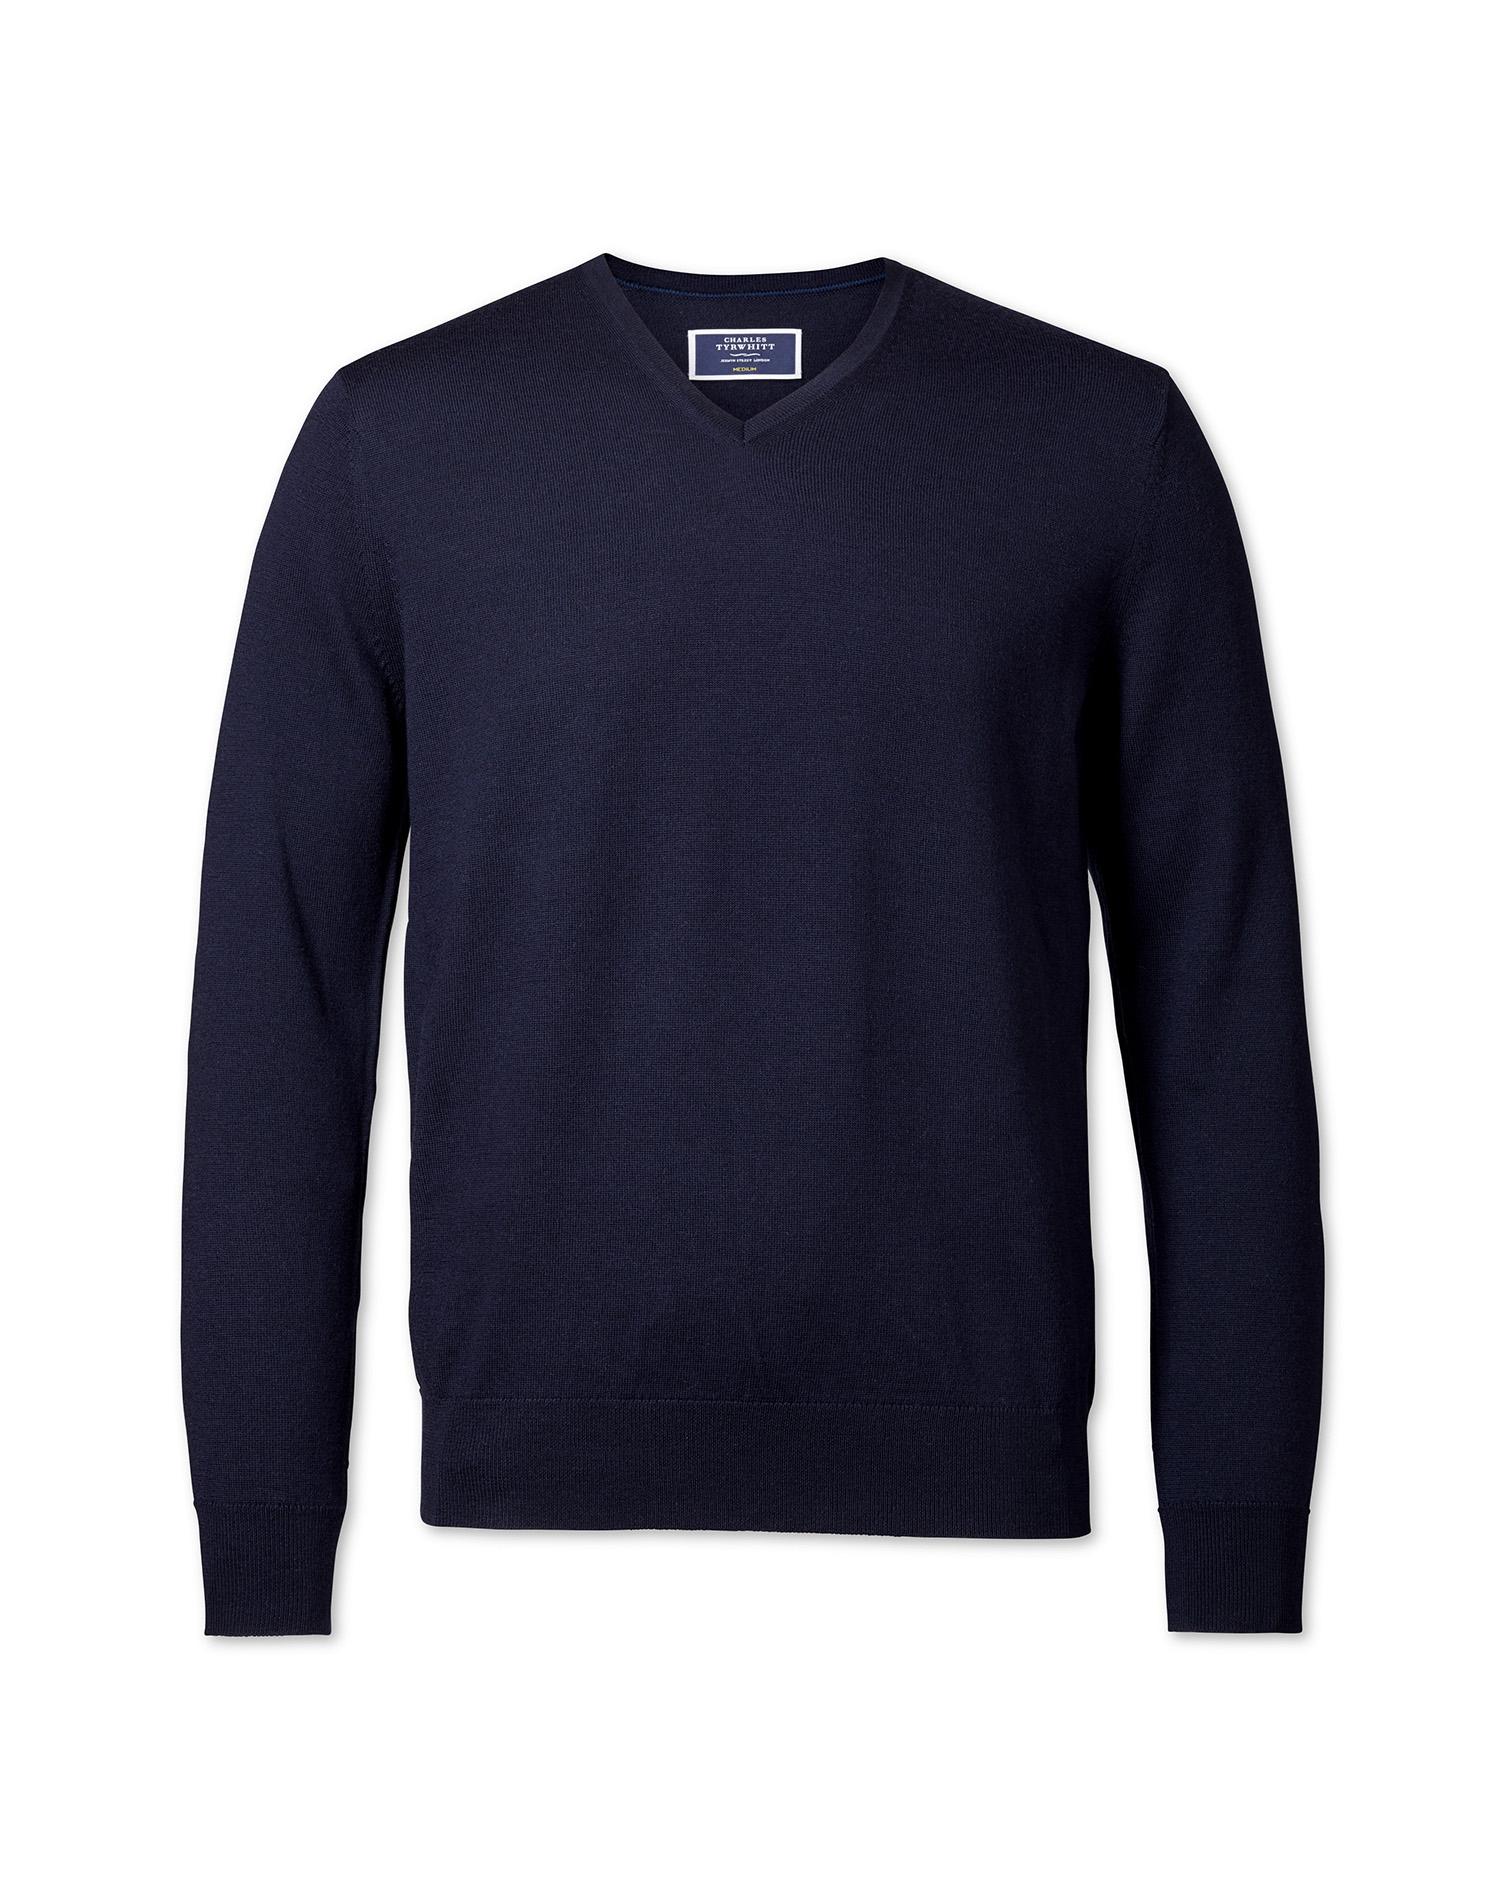 Navy Merino Wool V-Neck Jumper Size Small by Charles Tyrwhitt